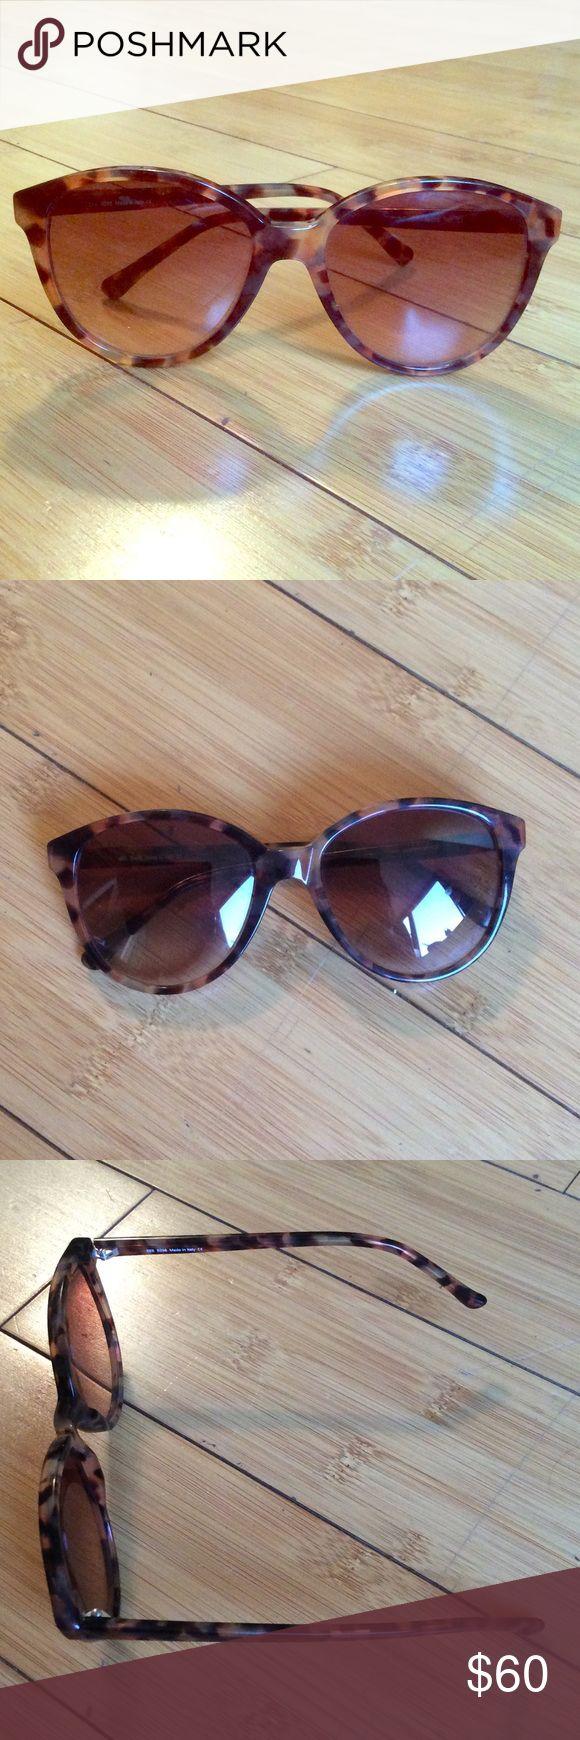 Tortoise Shell Sunglasses Super cute brown tortoise shell sunglasses SEE Accessories Sunglasses